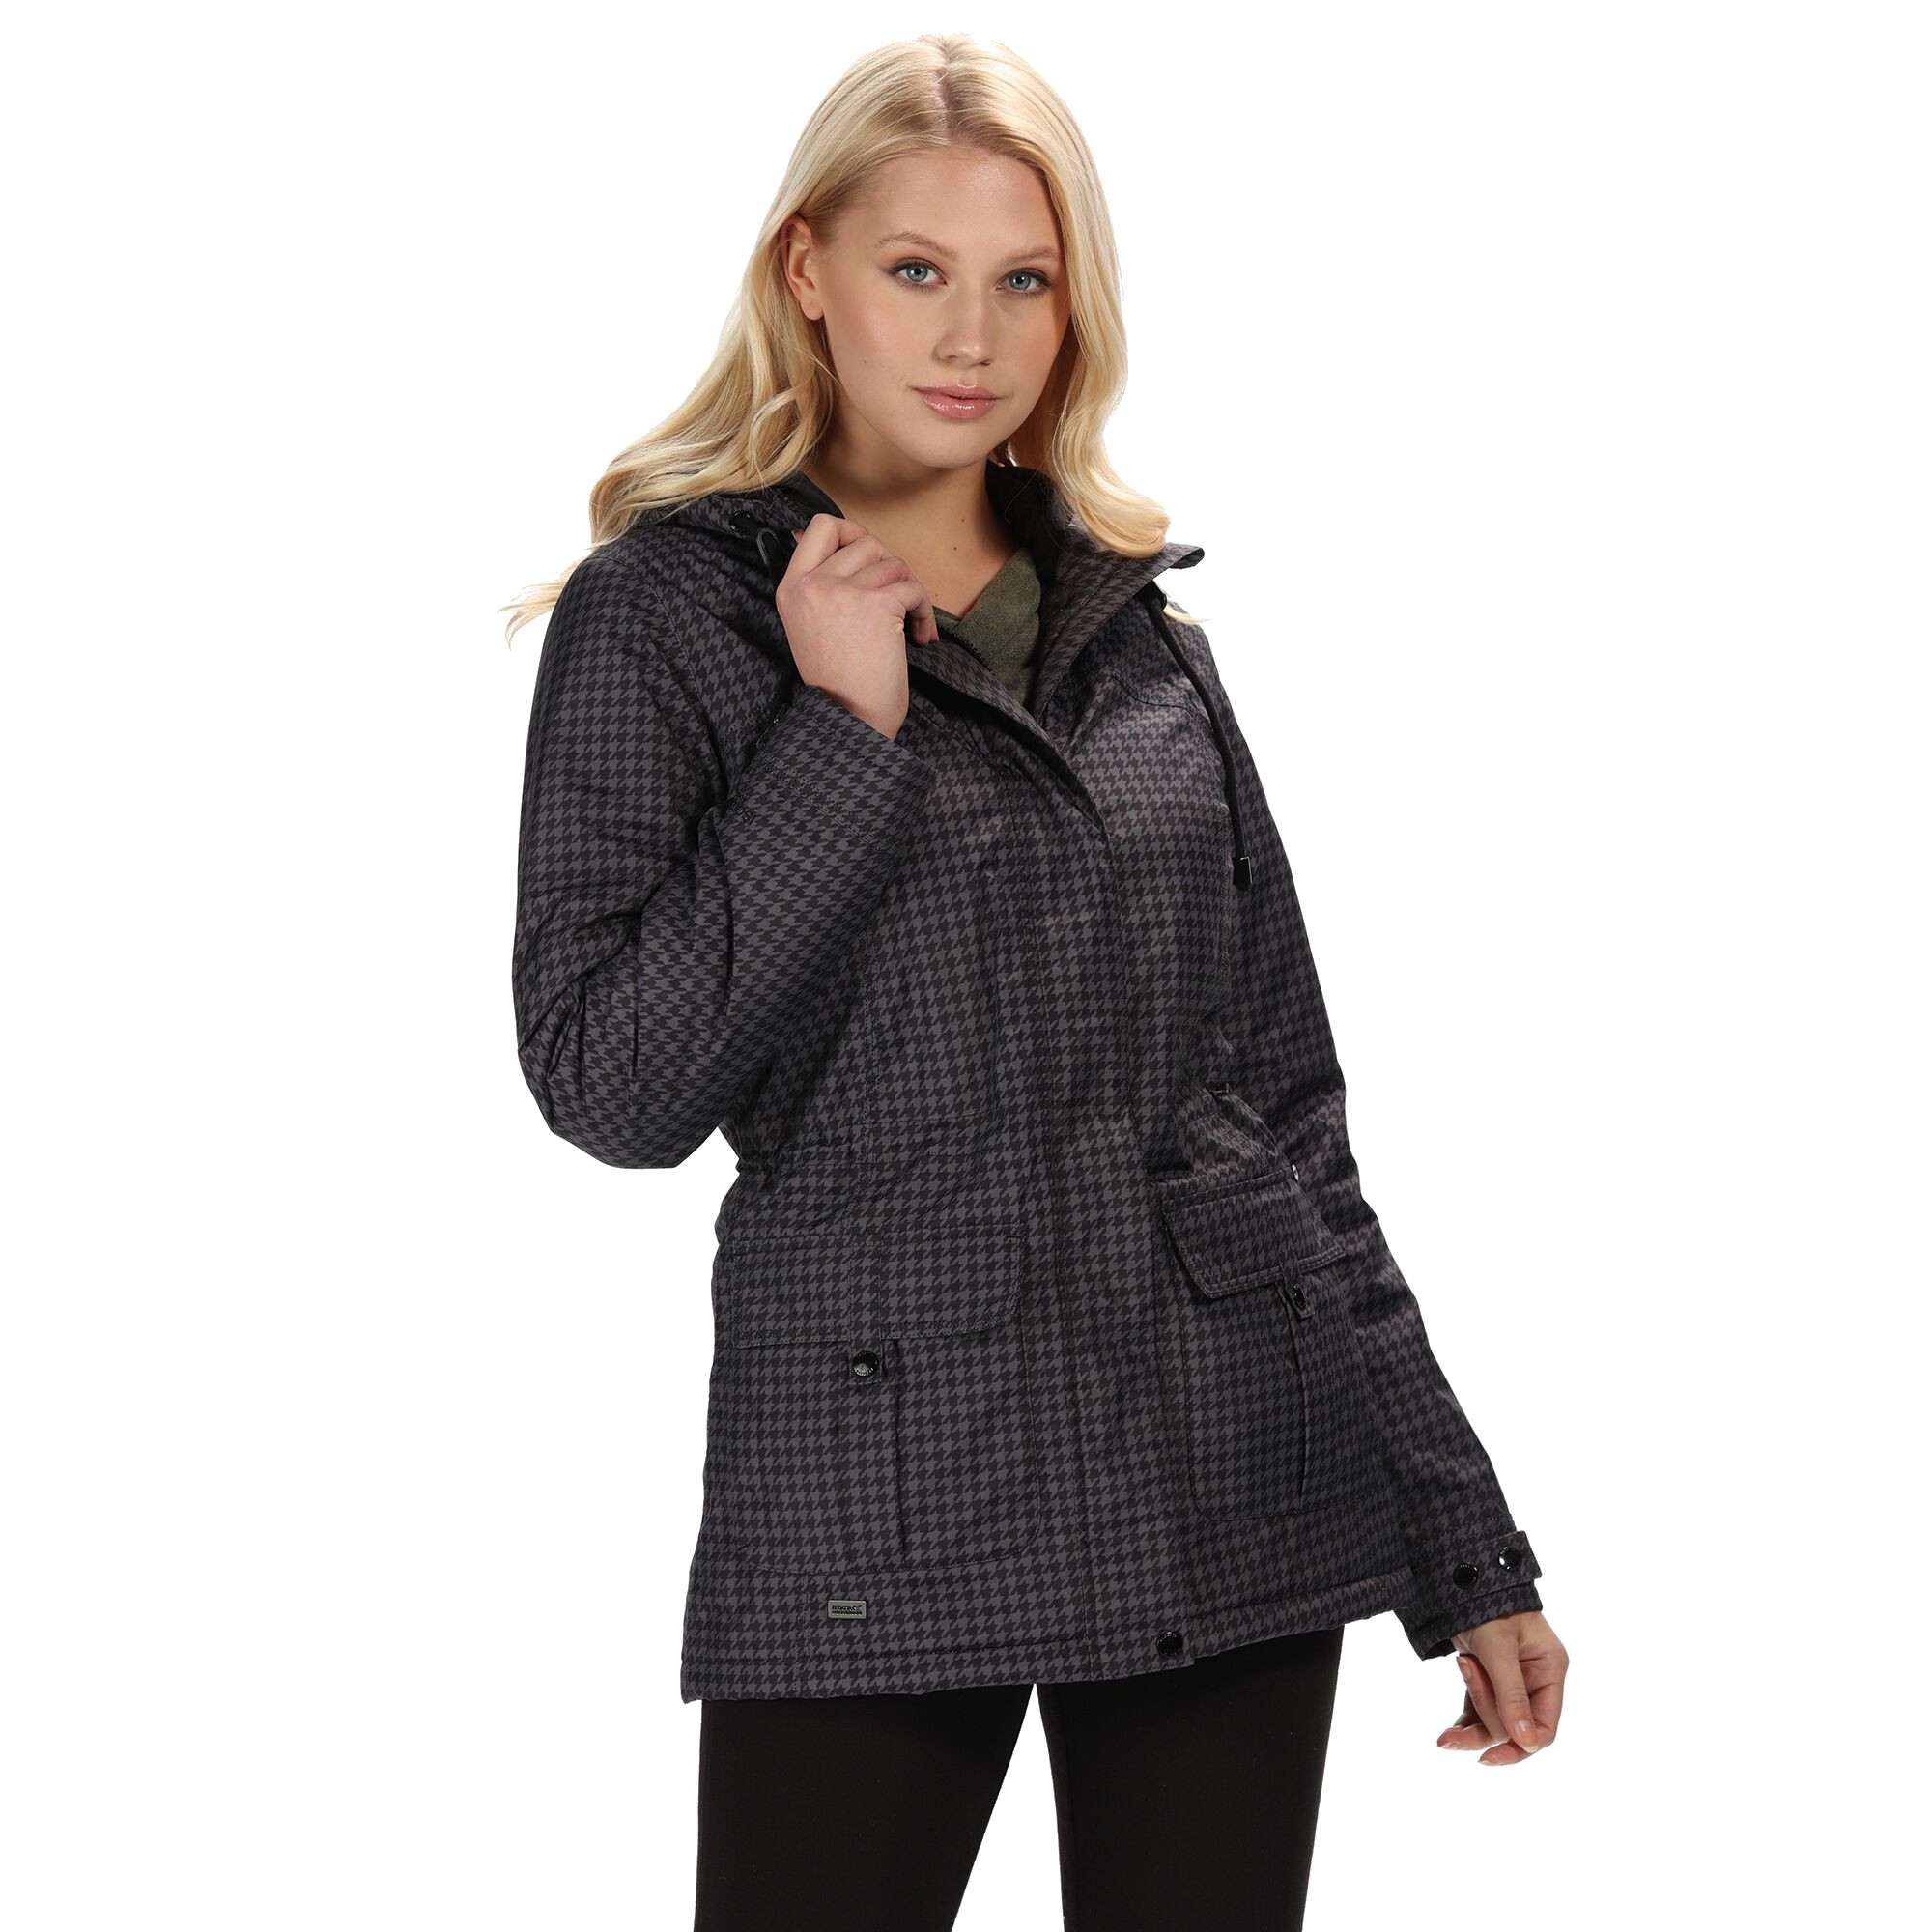 Regatta-Womens-Ladies-Braelynn-Long-Length-Waterproof-Jacket-RG4552 thumbnail 5